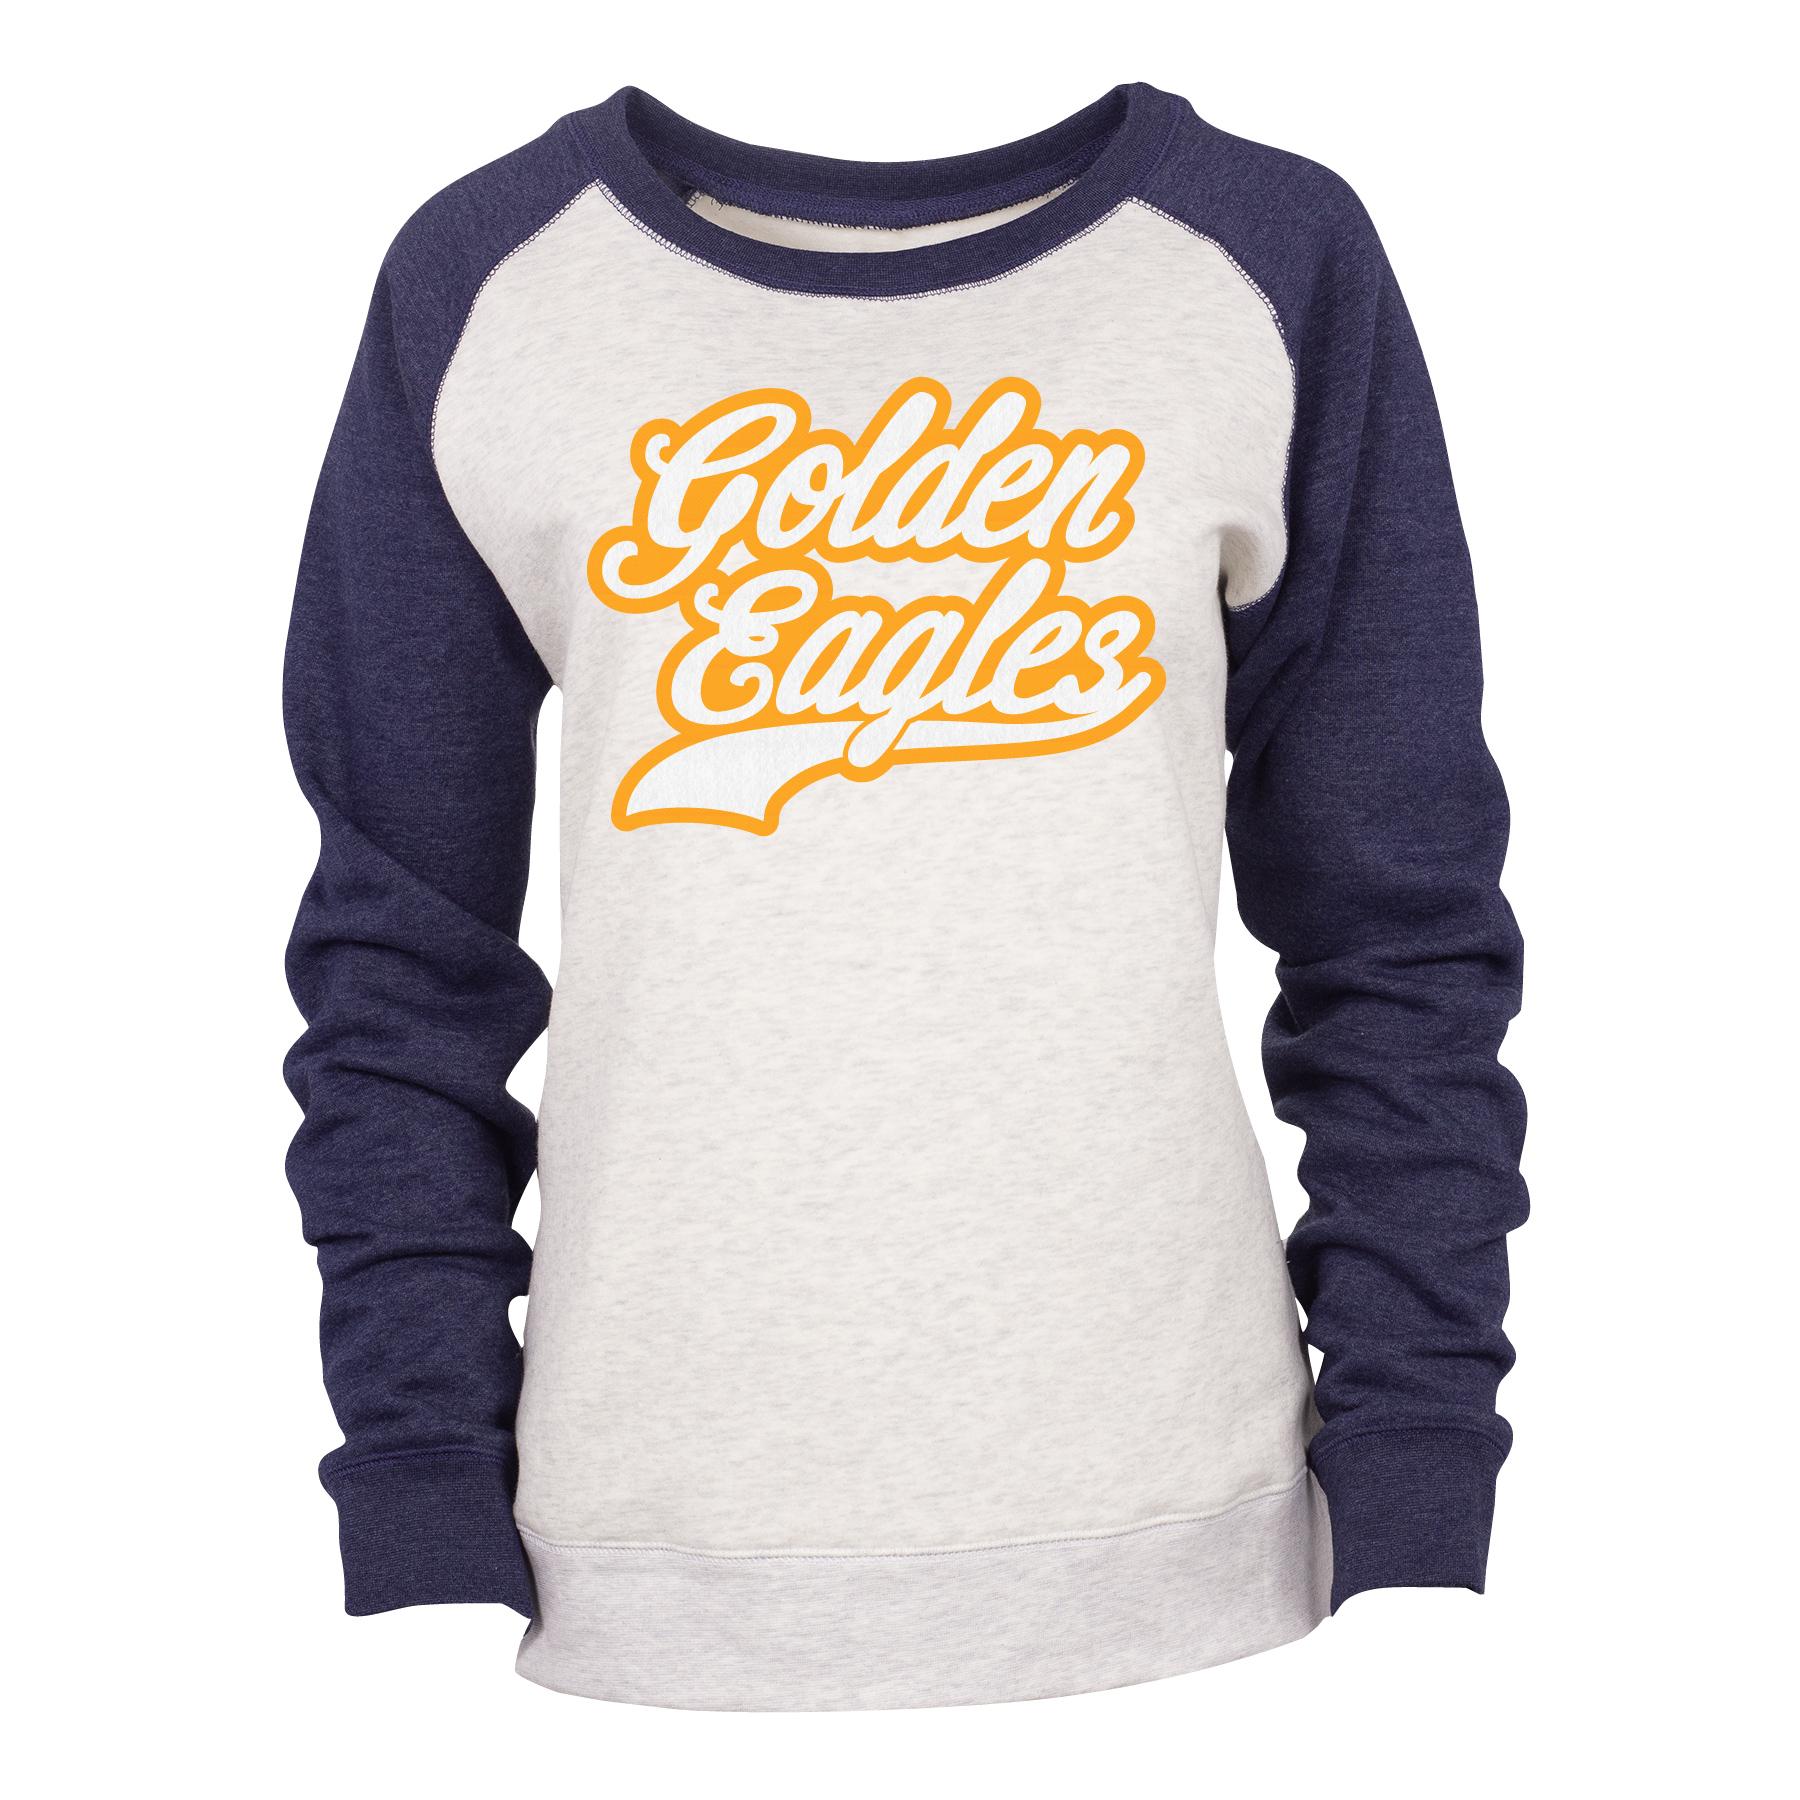 Cozy Crew Sweatshirt